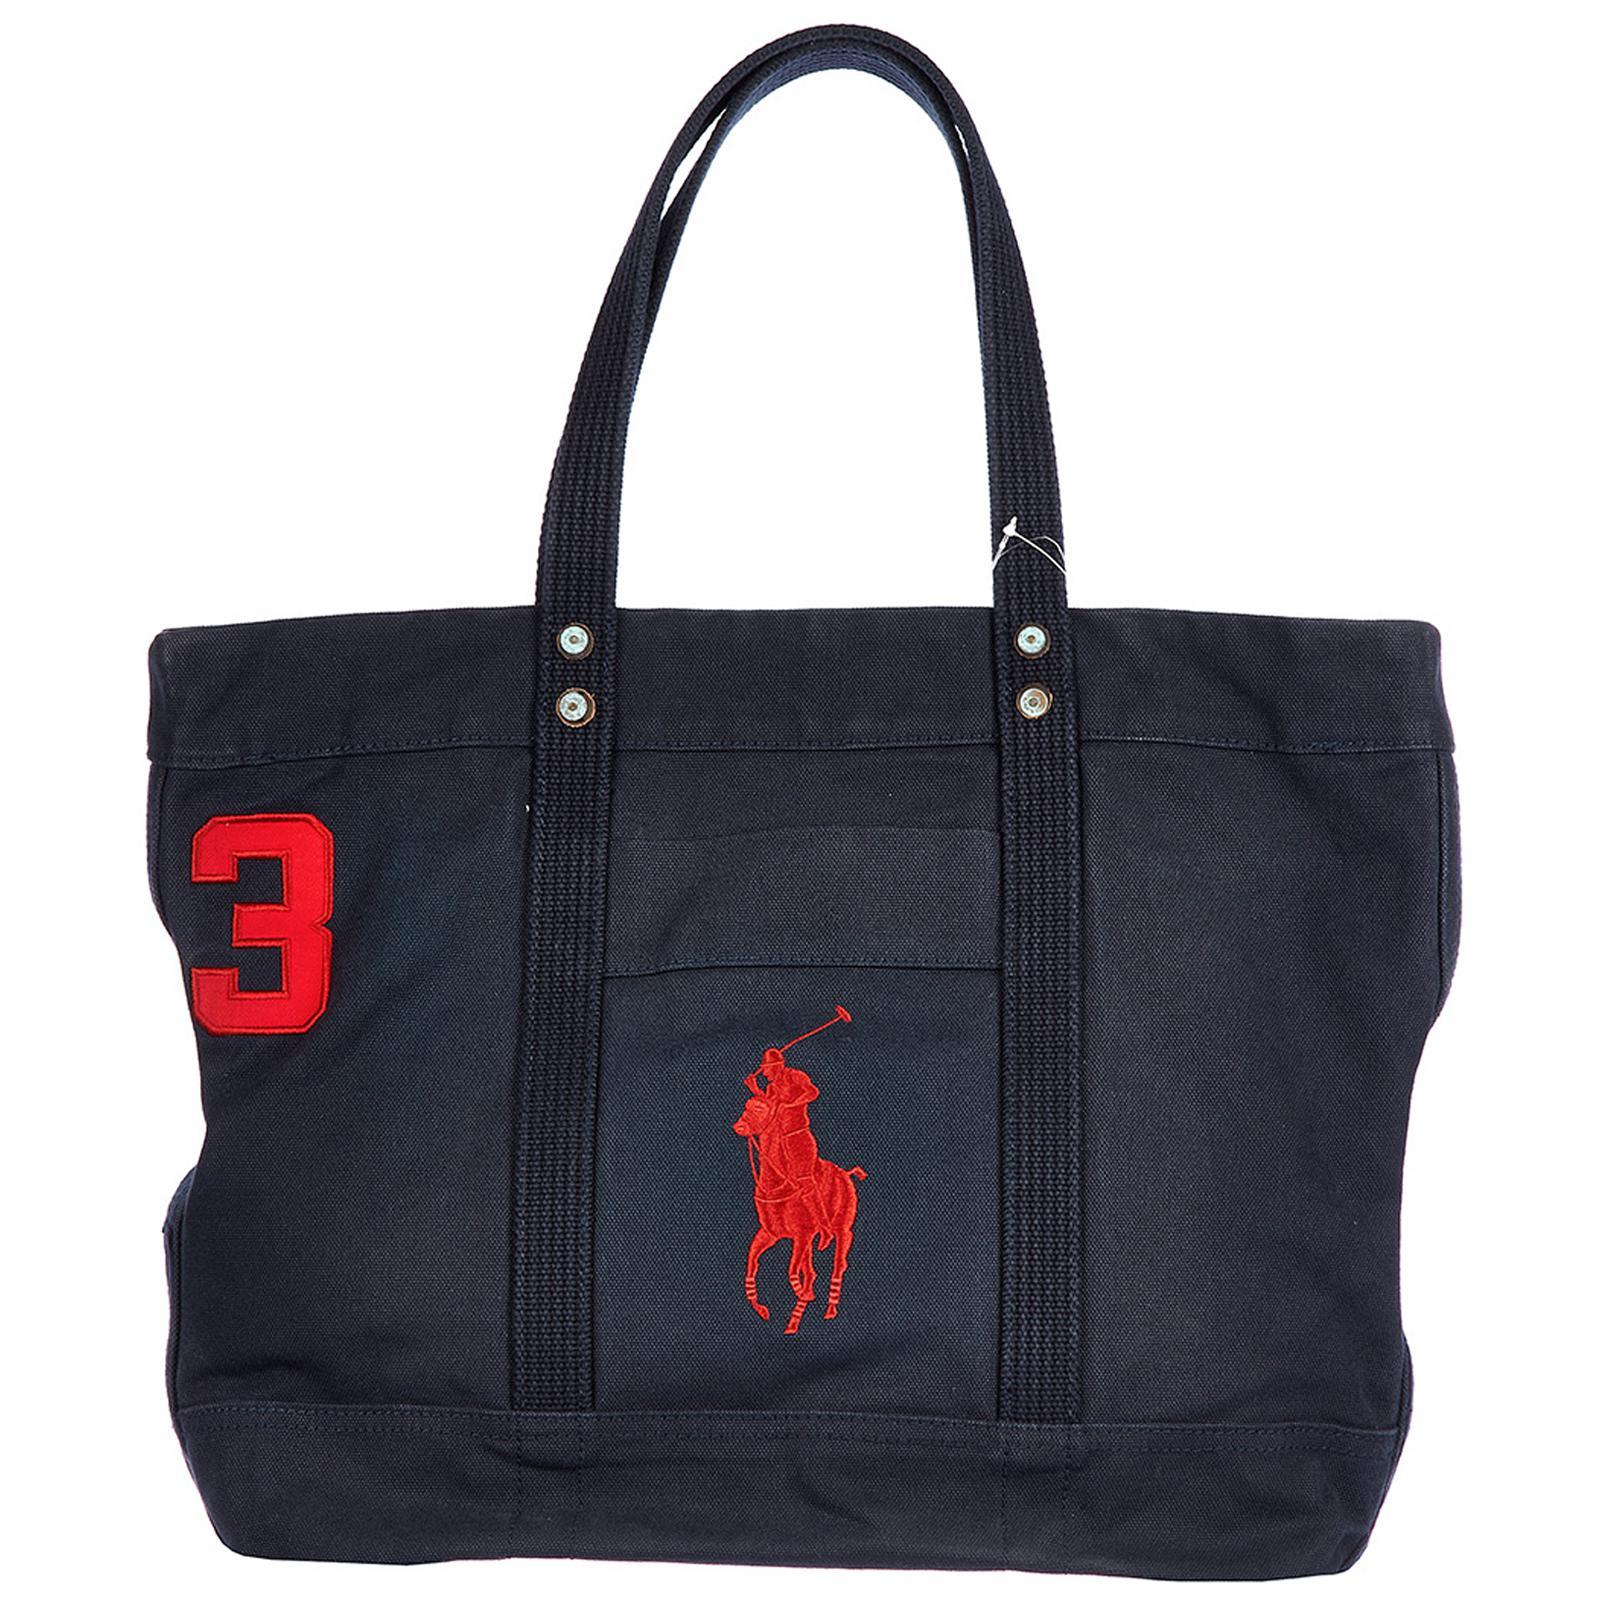 05ffaadfc8 Polo Ralph Lauren Bag Handbag Shopping Tote Canvas Aviator in Blue ...